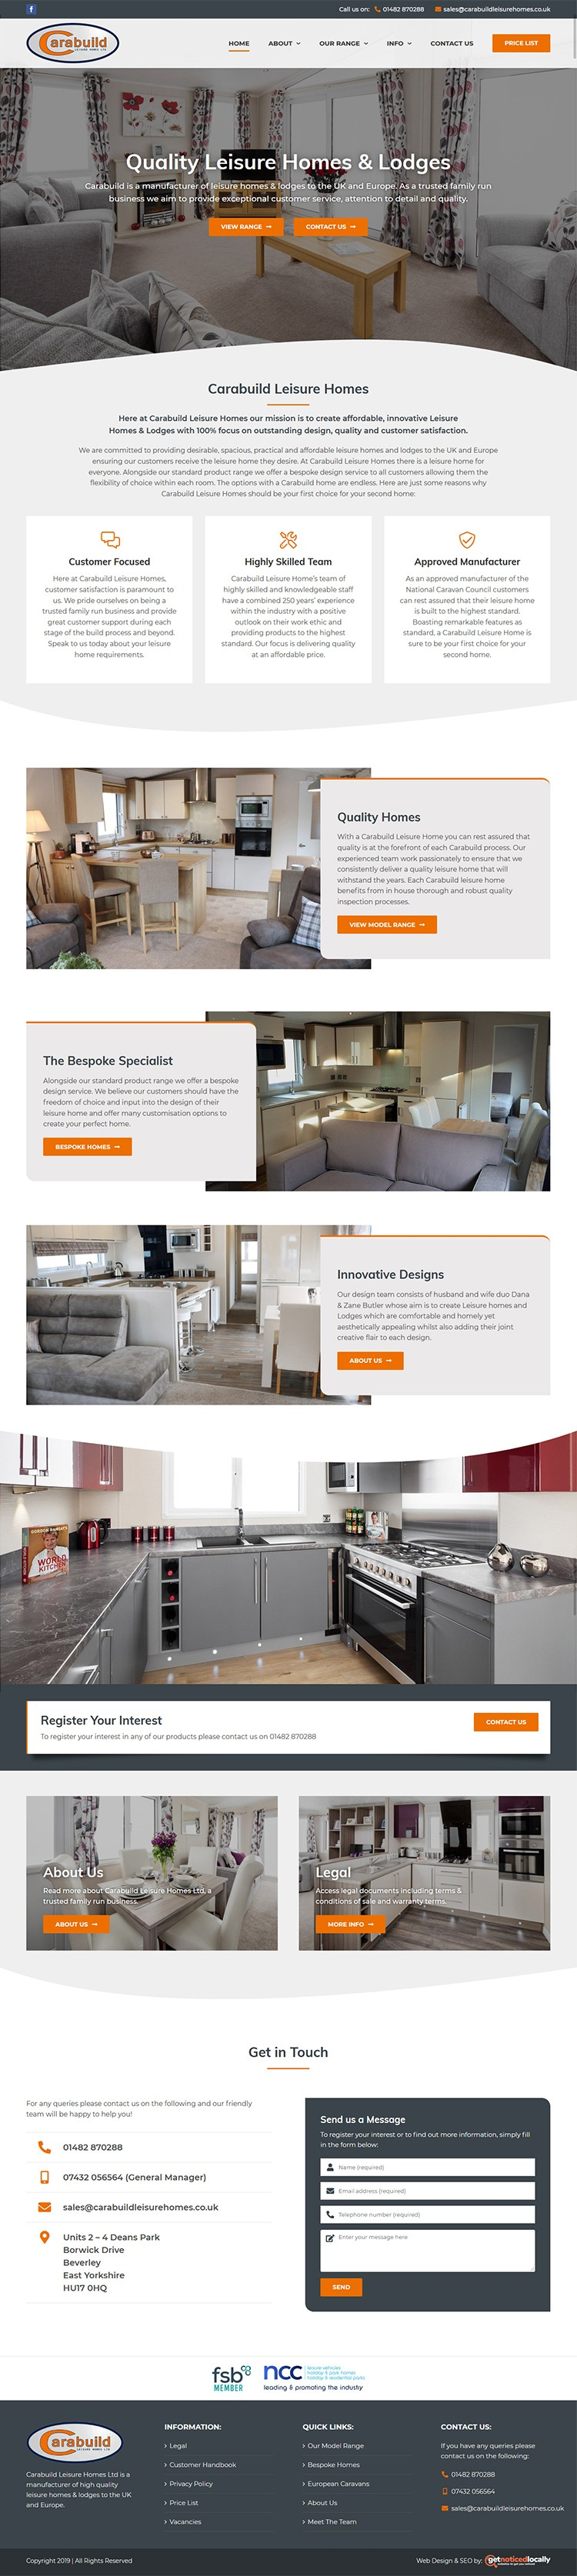 Web Design for Carabuild Leisure Homes